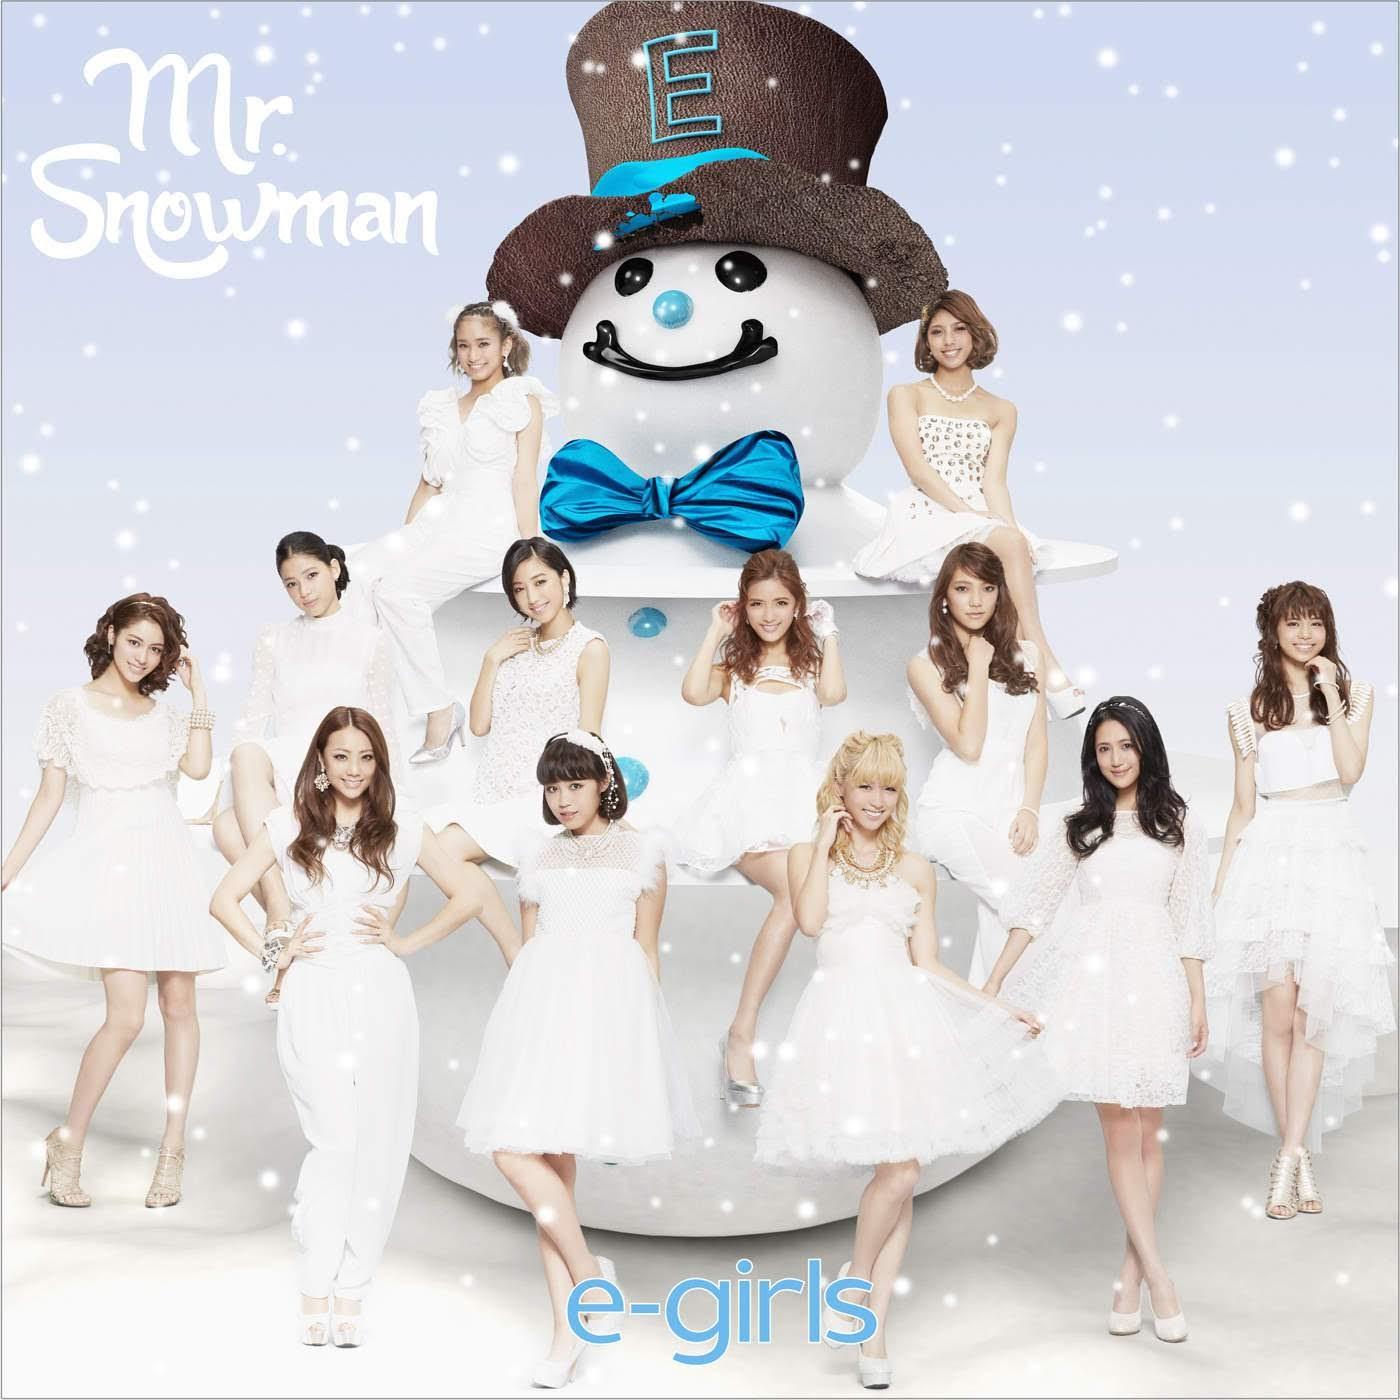 Single - E-girls - Mr. Snowman